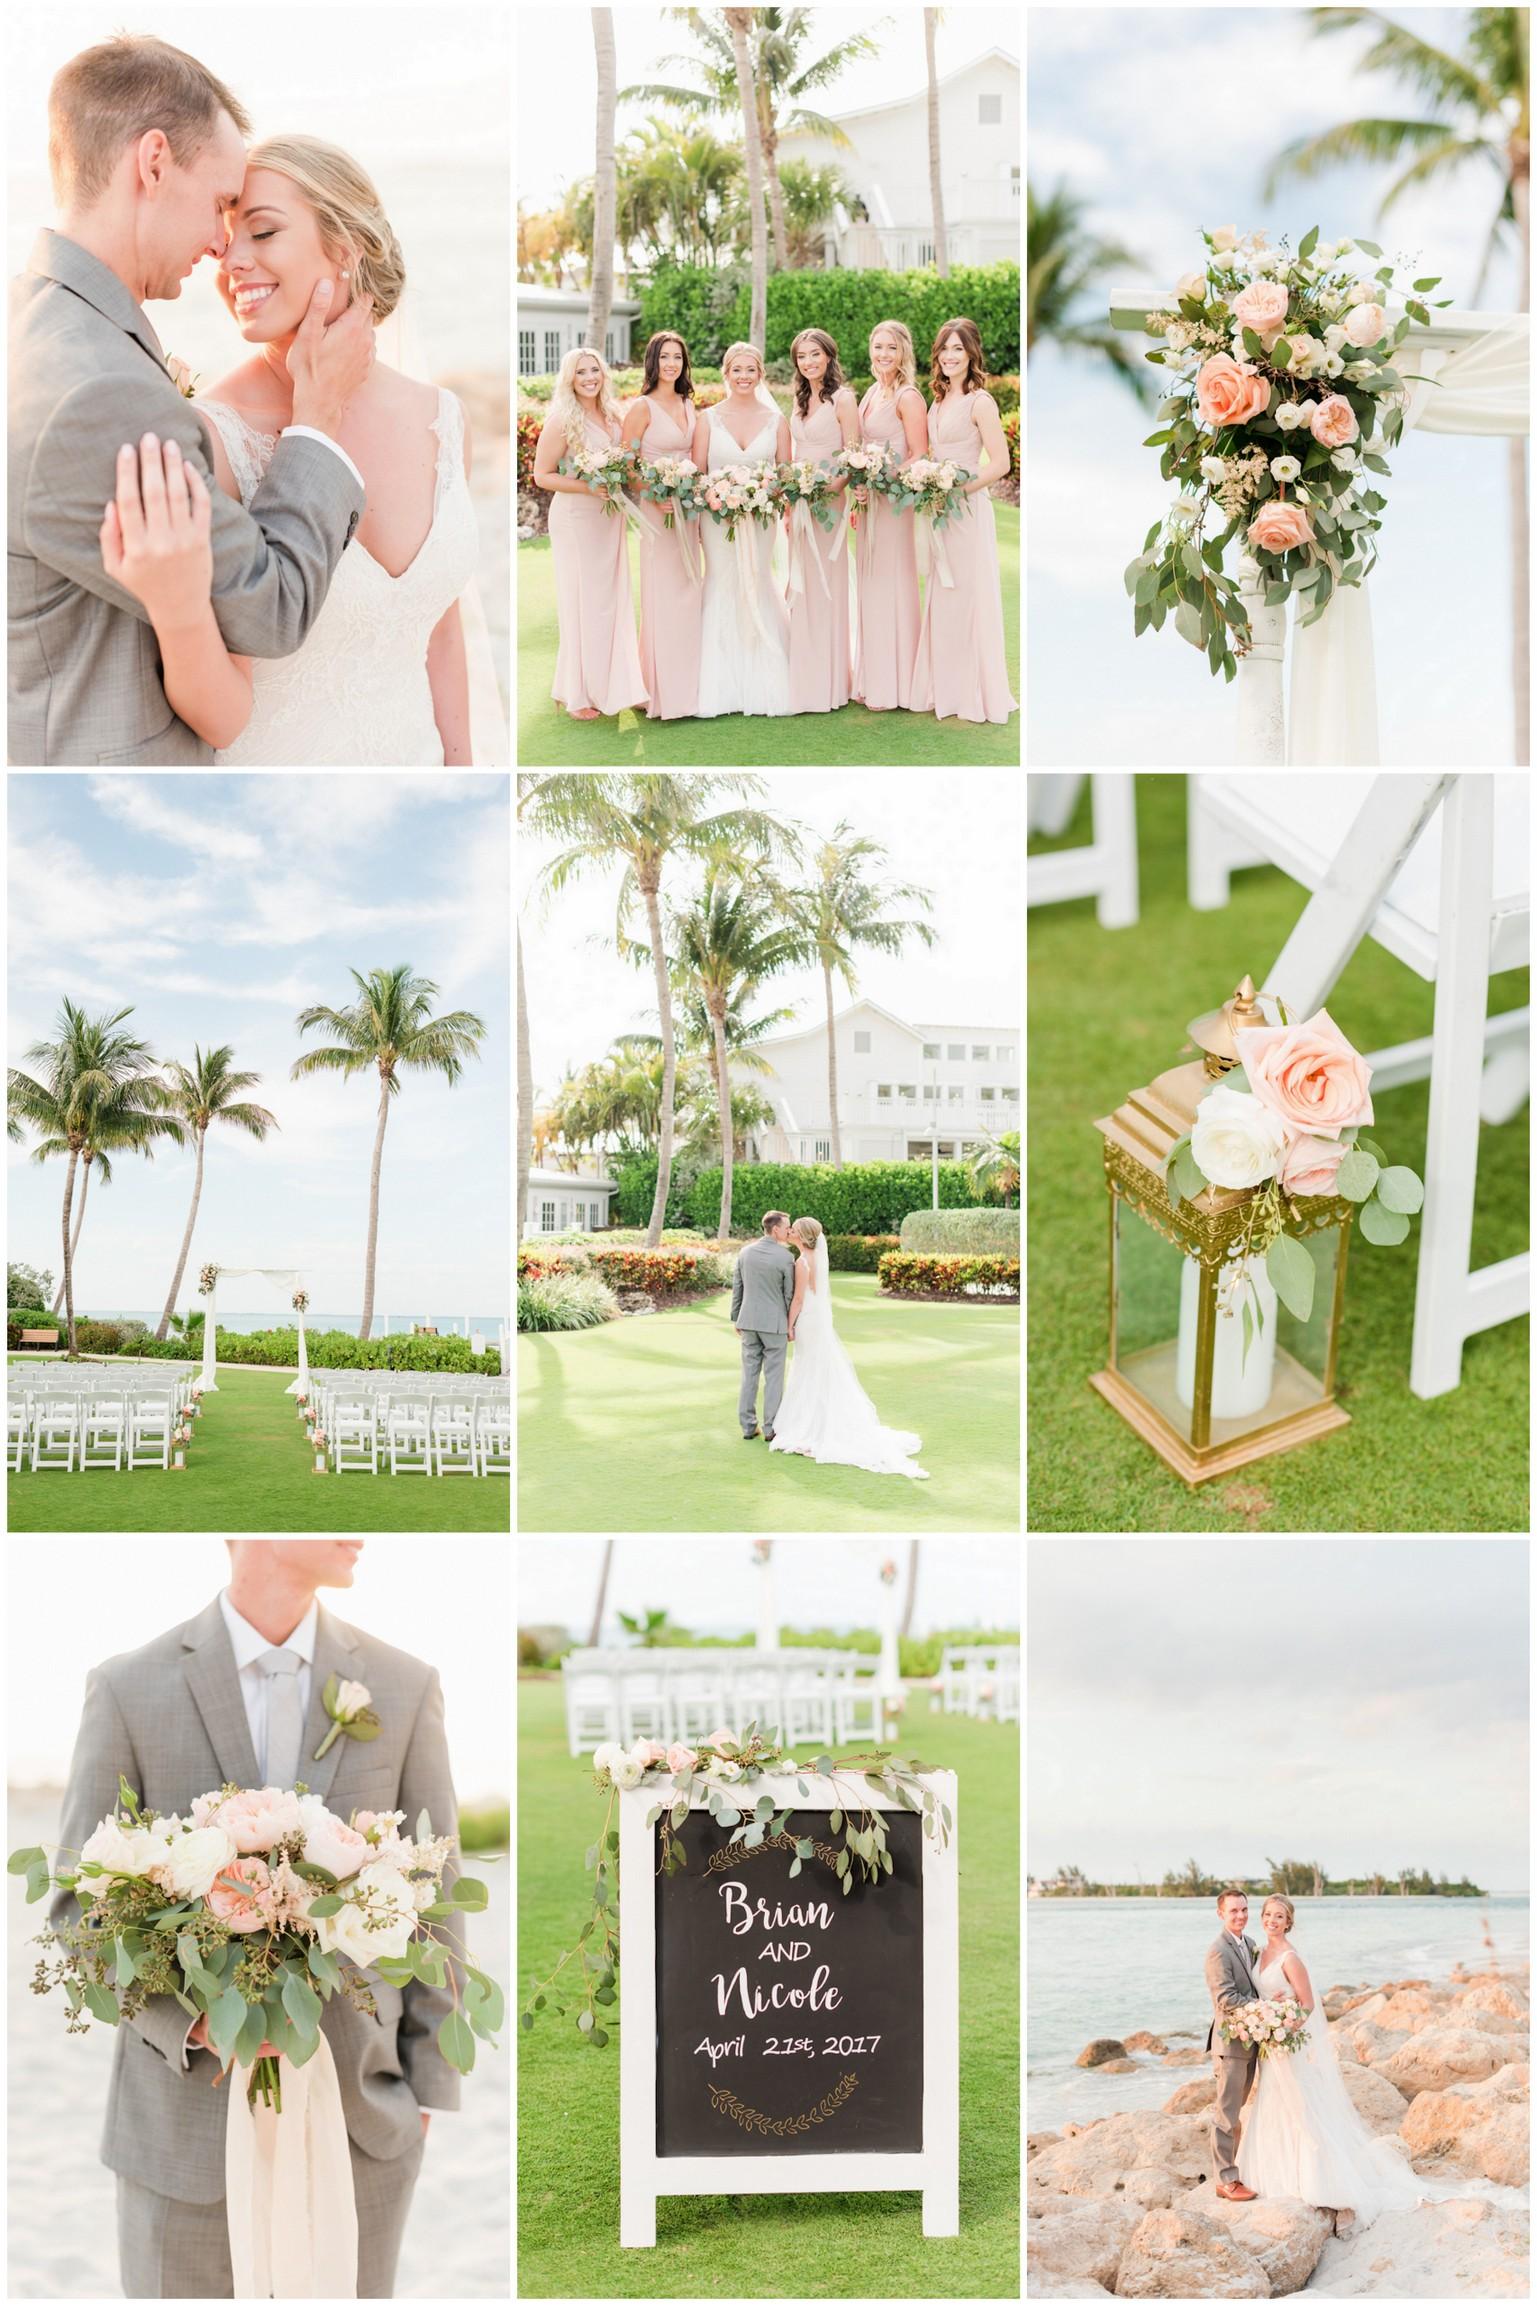 South Seas Island Resort Florida wedding